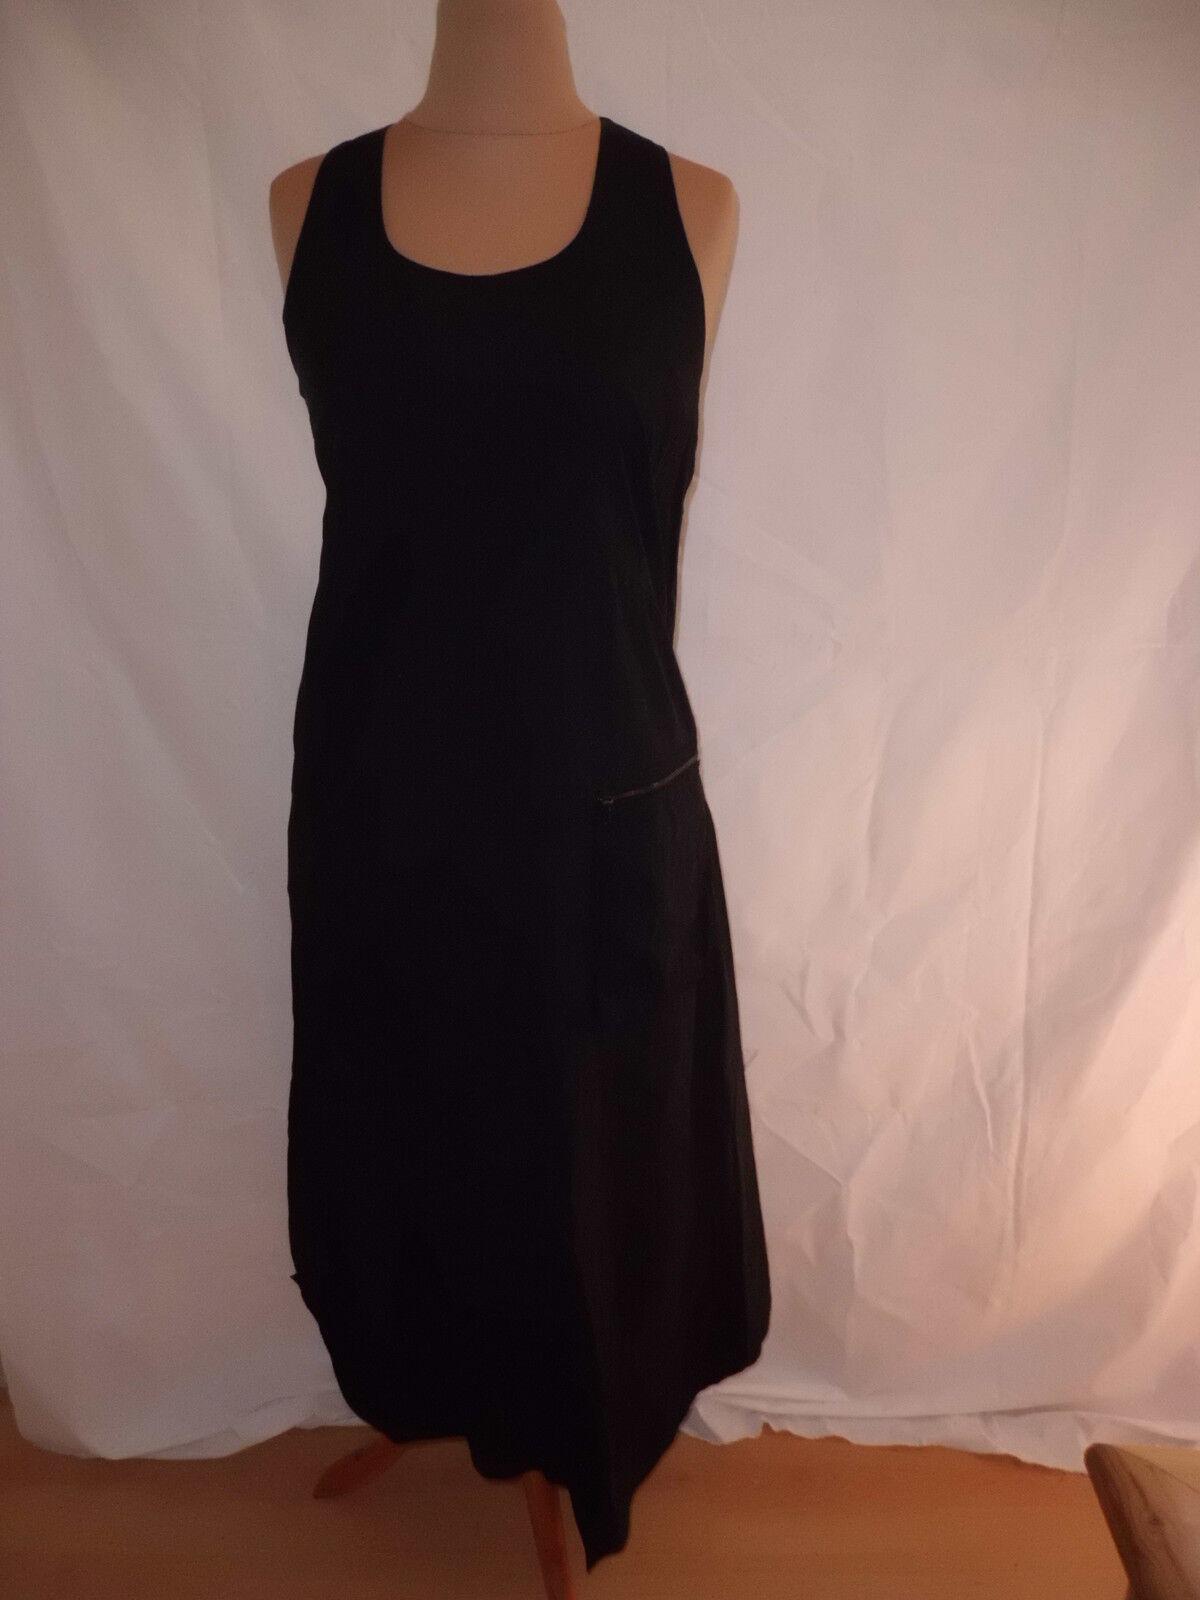 Robe Ikks black size 40  à  -65%